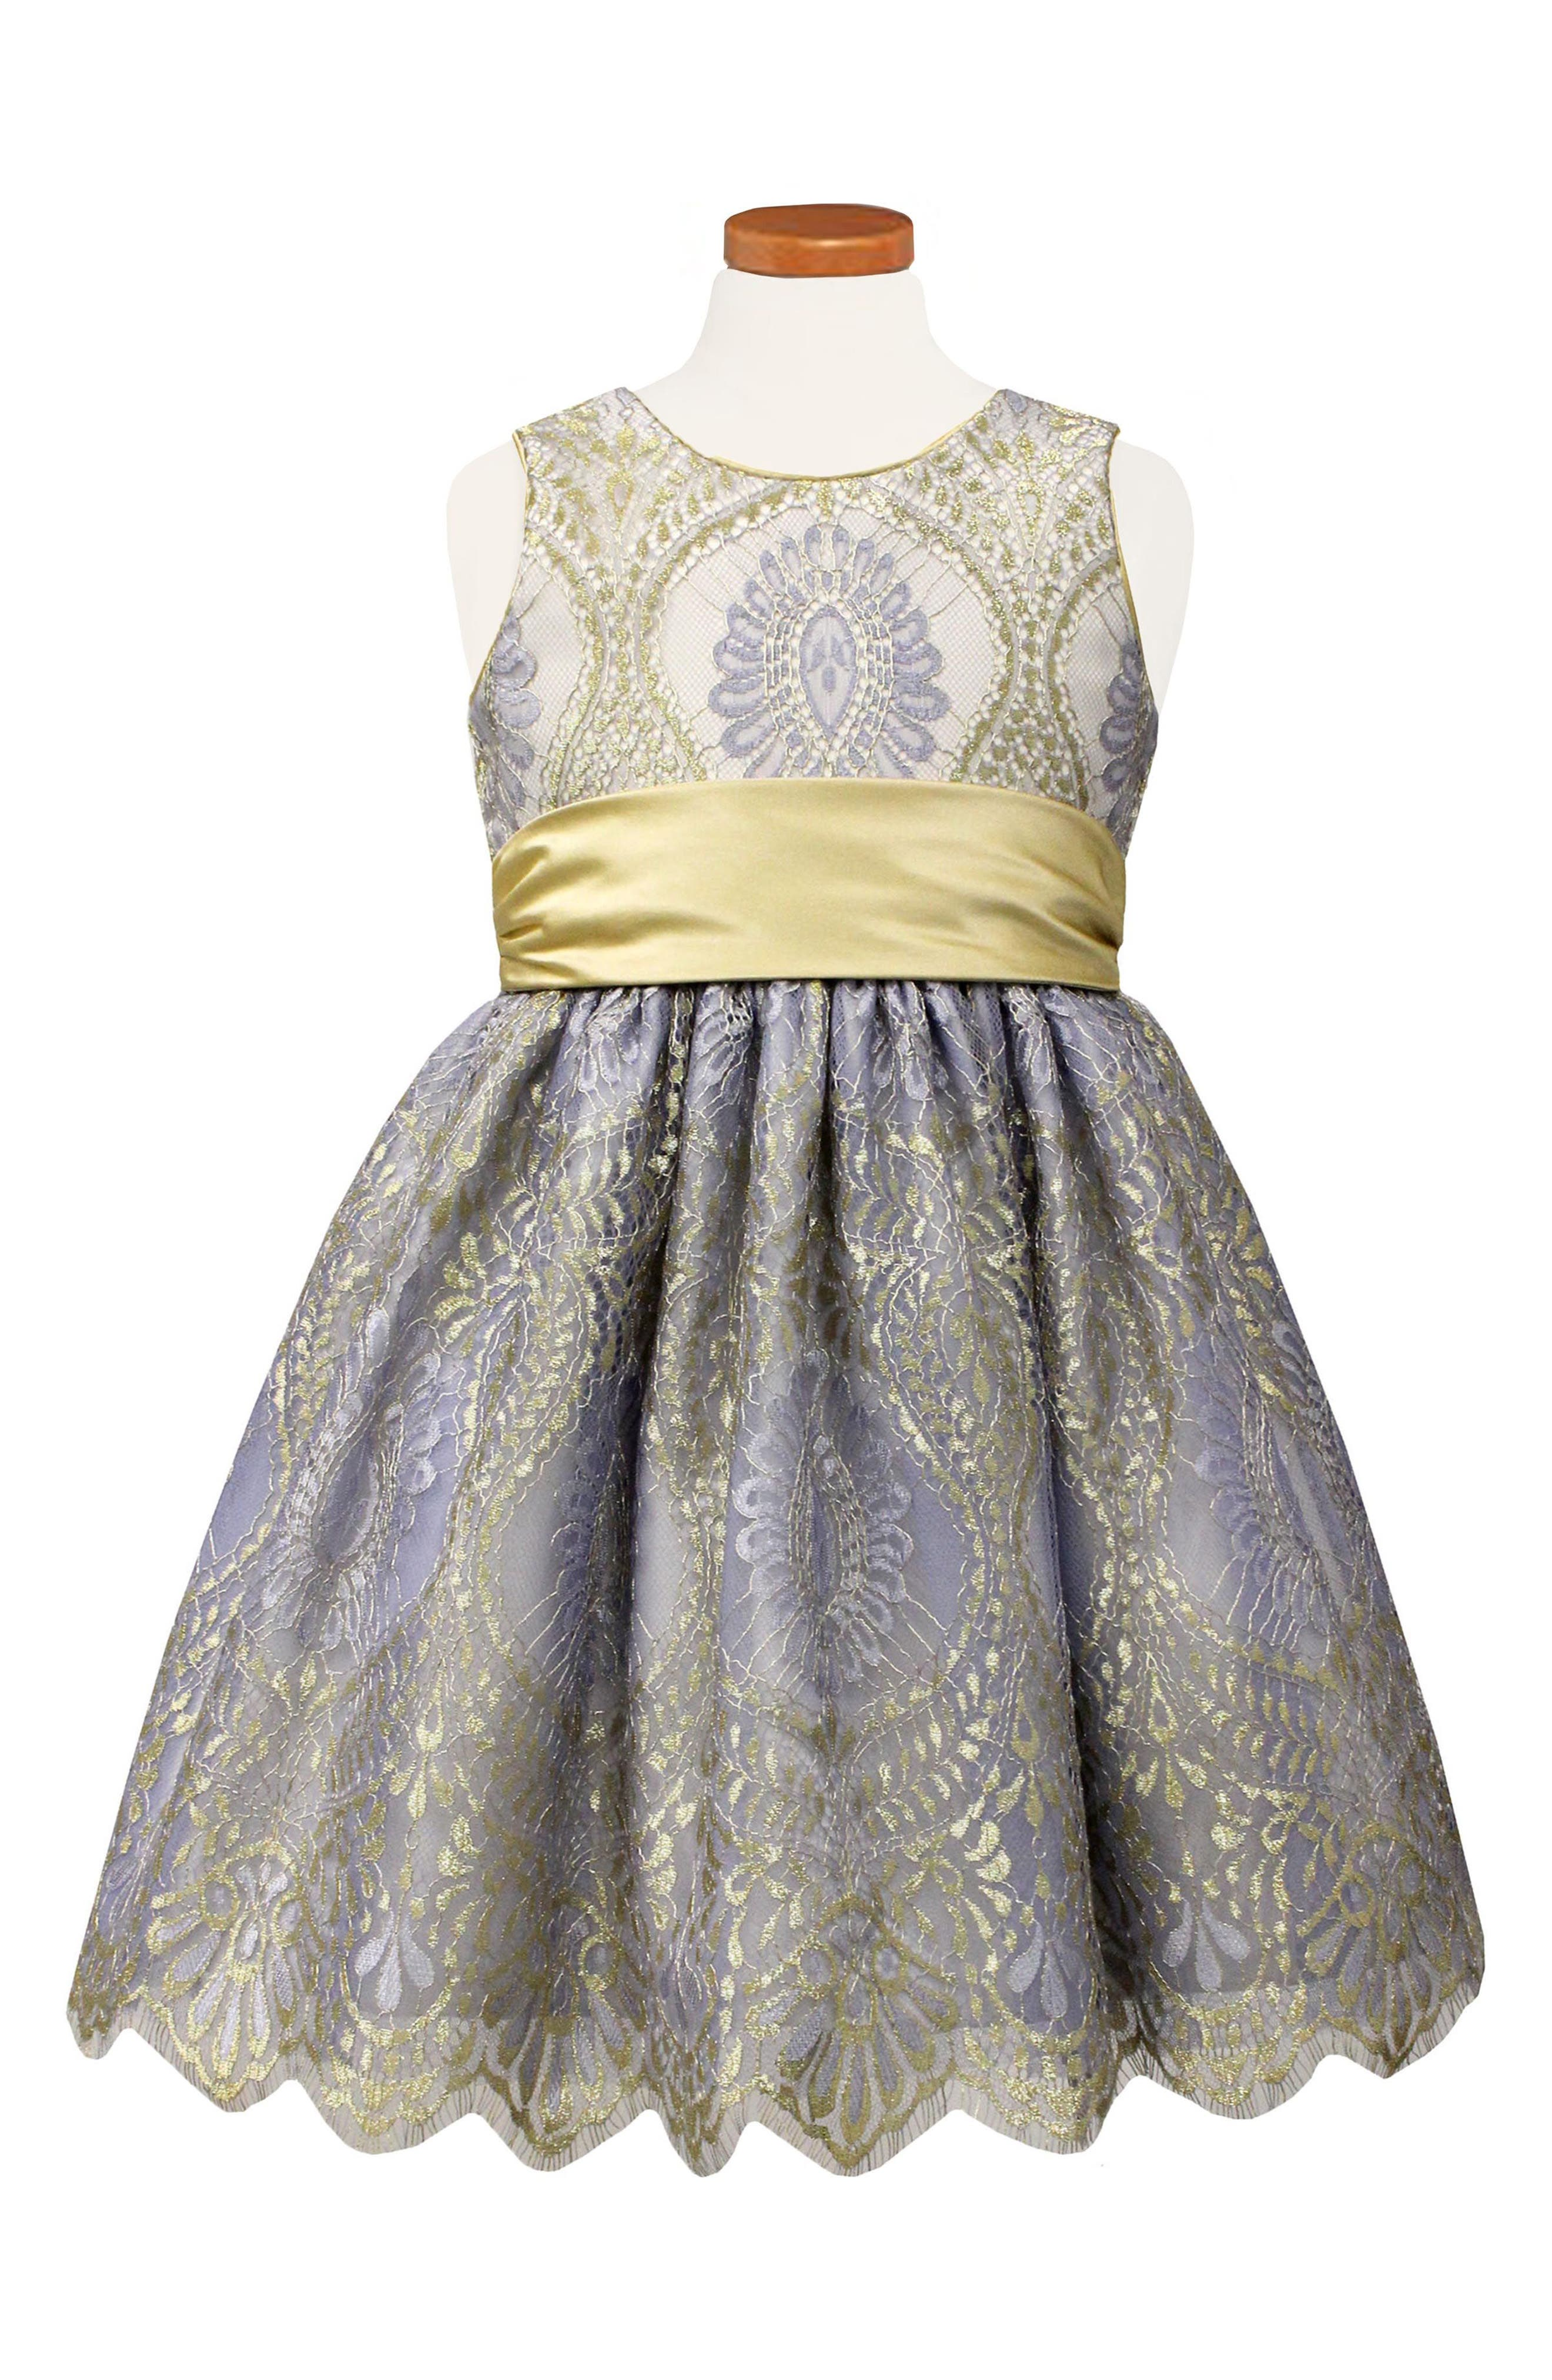 Sorbet Lace Party Dress (Toddler Girls & Little Girls)